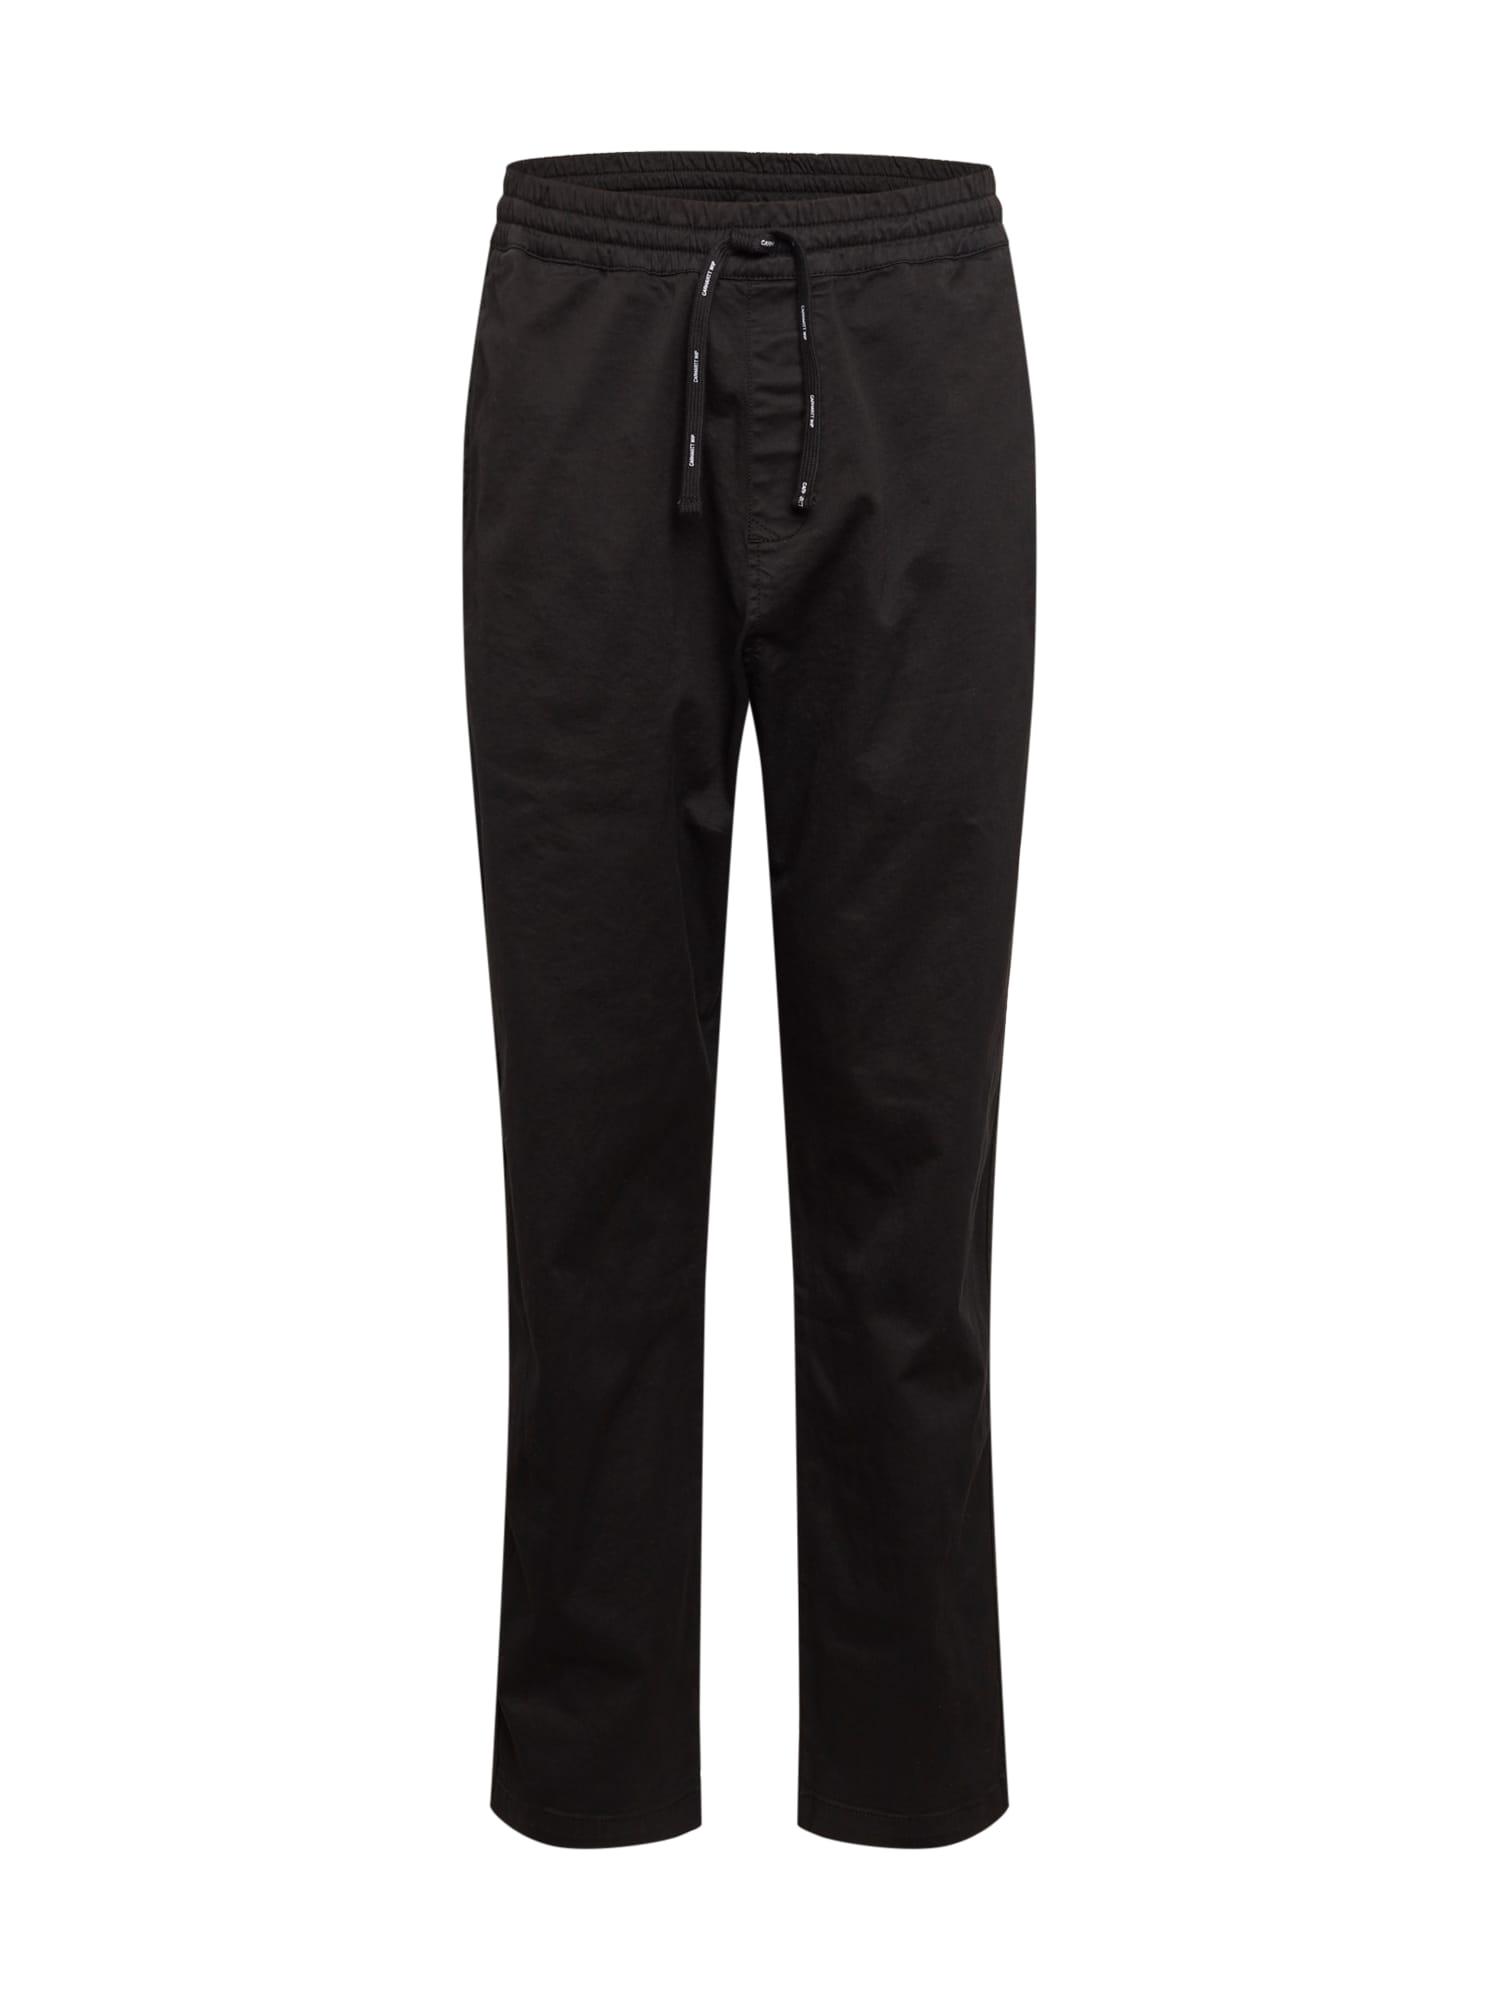 Carhartt WIP Kelnės ' Lawton ' juoda